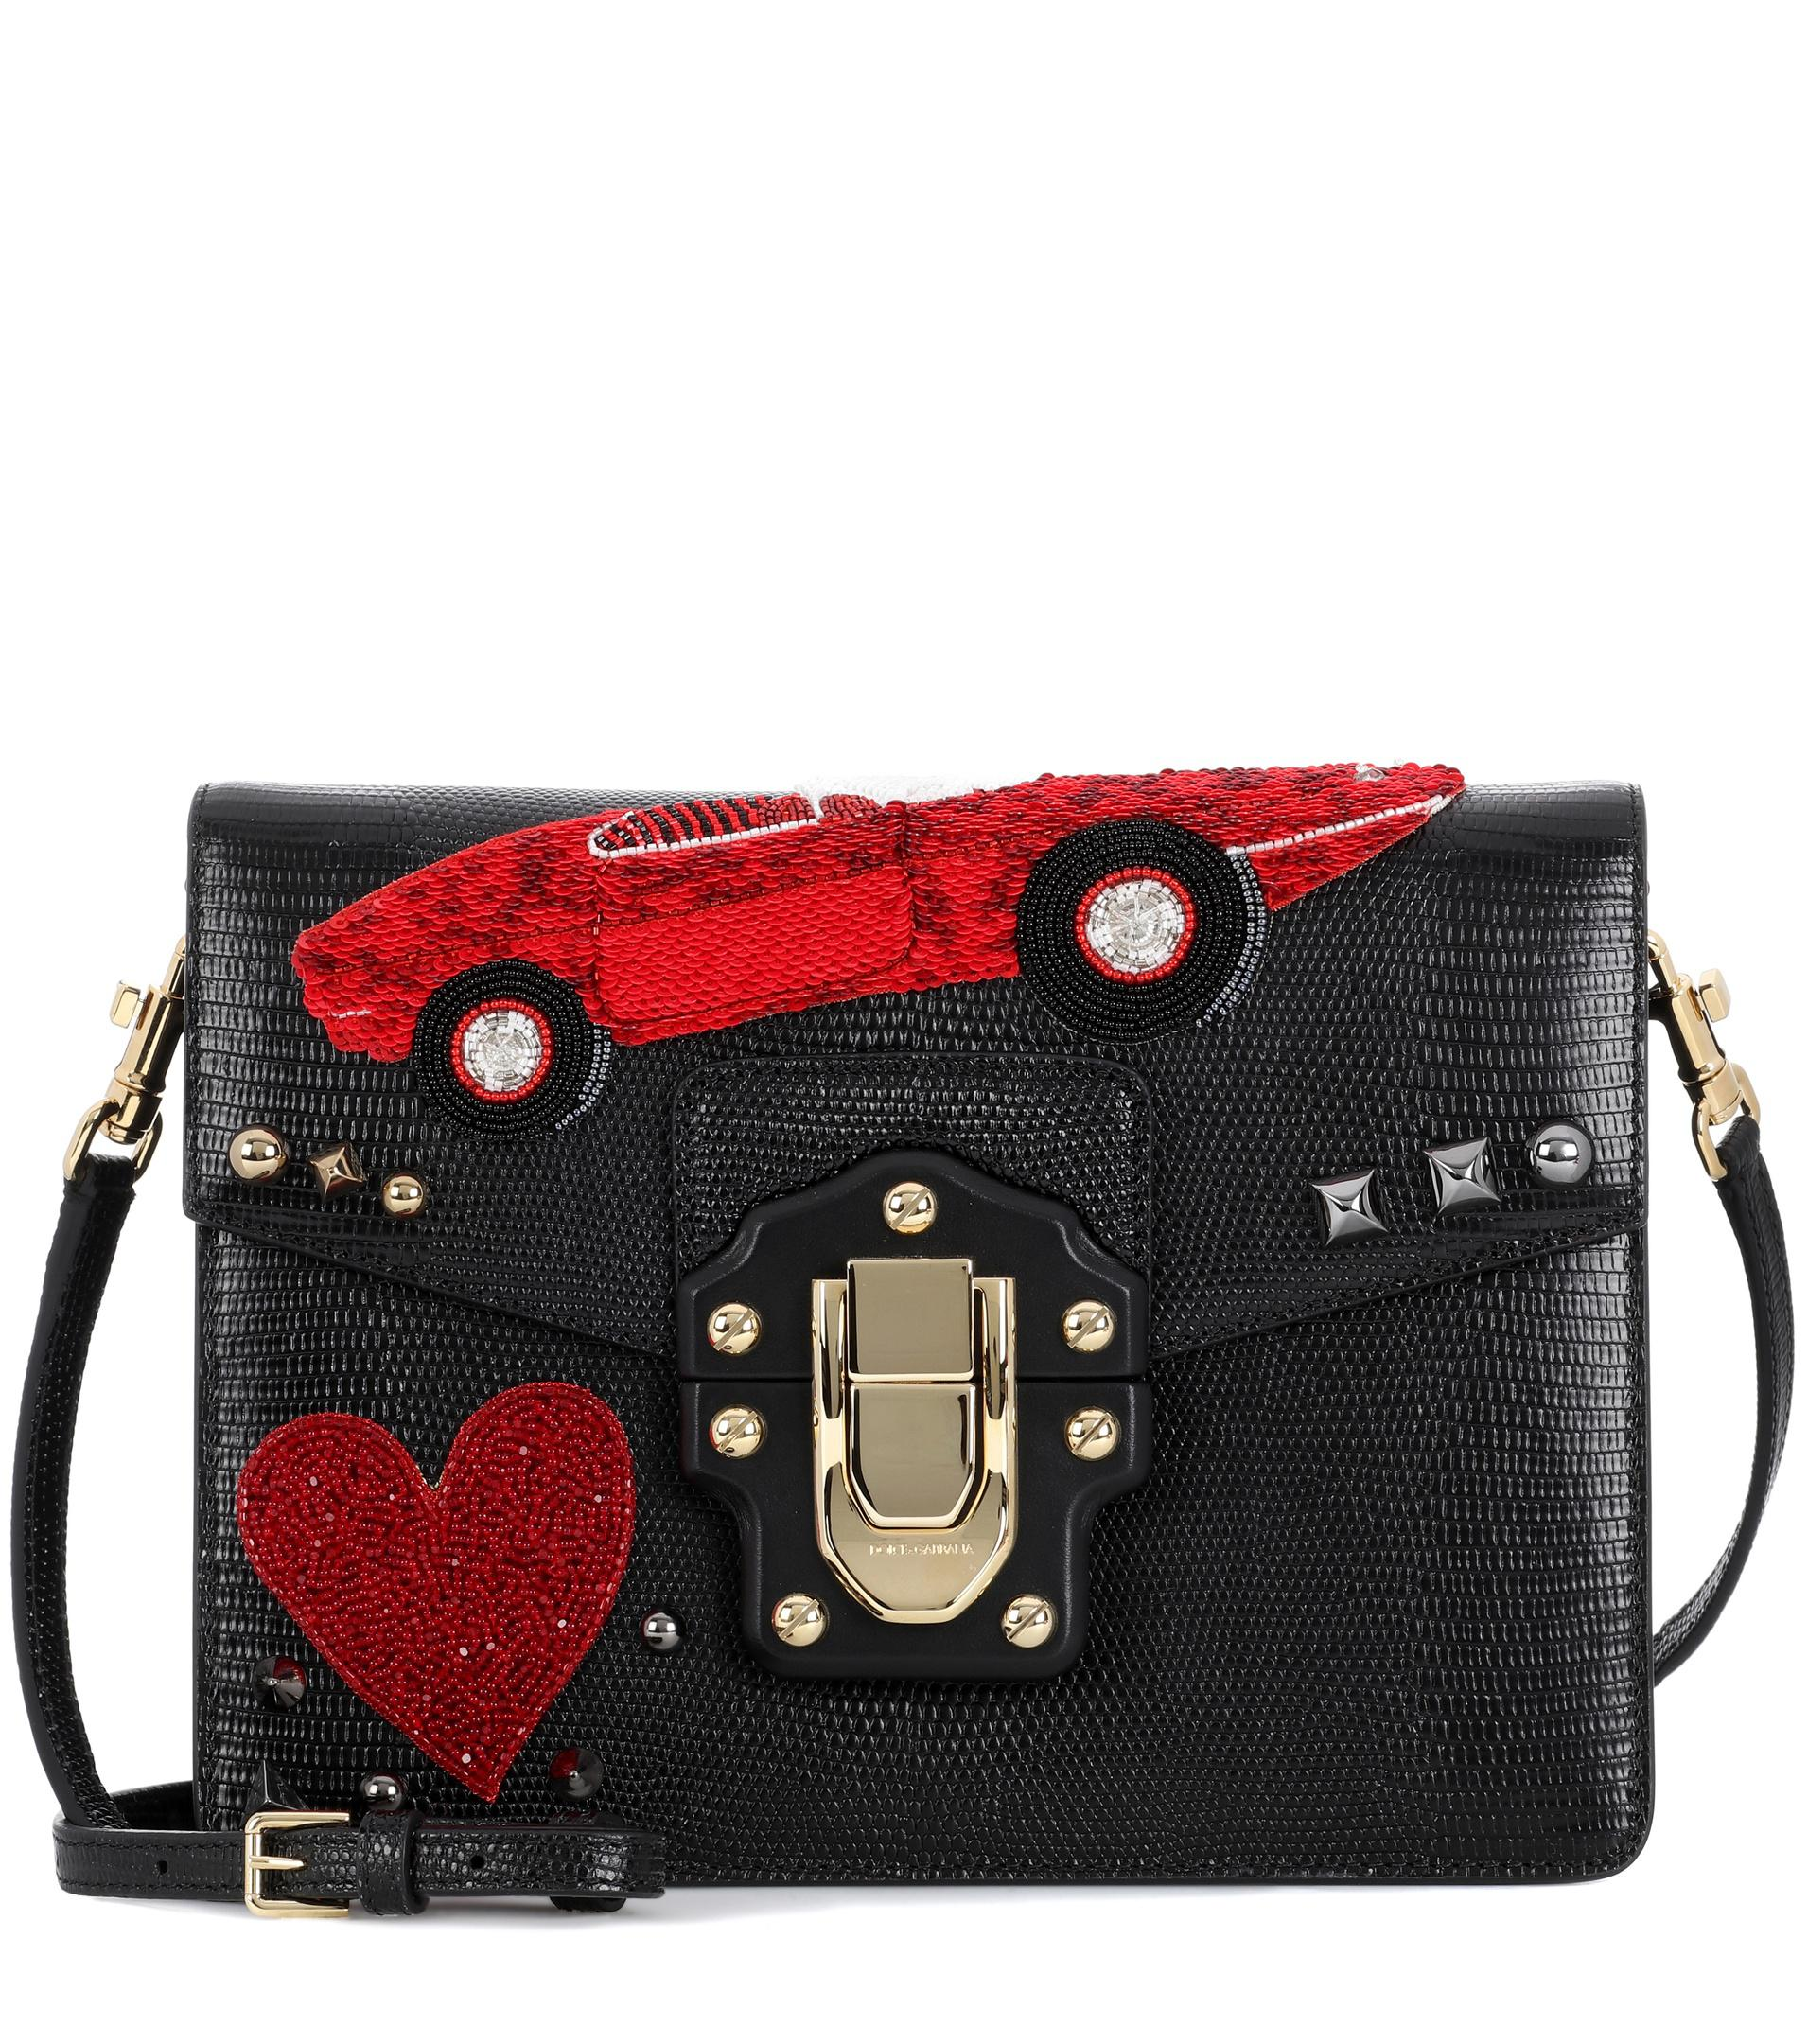 9a032cf90cb7 Lyst - Dolce   Gabbana Lucia Leather Shoulder Bag in Black